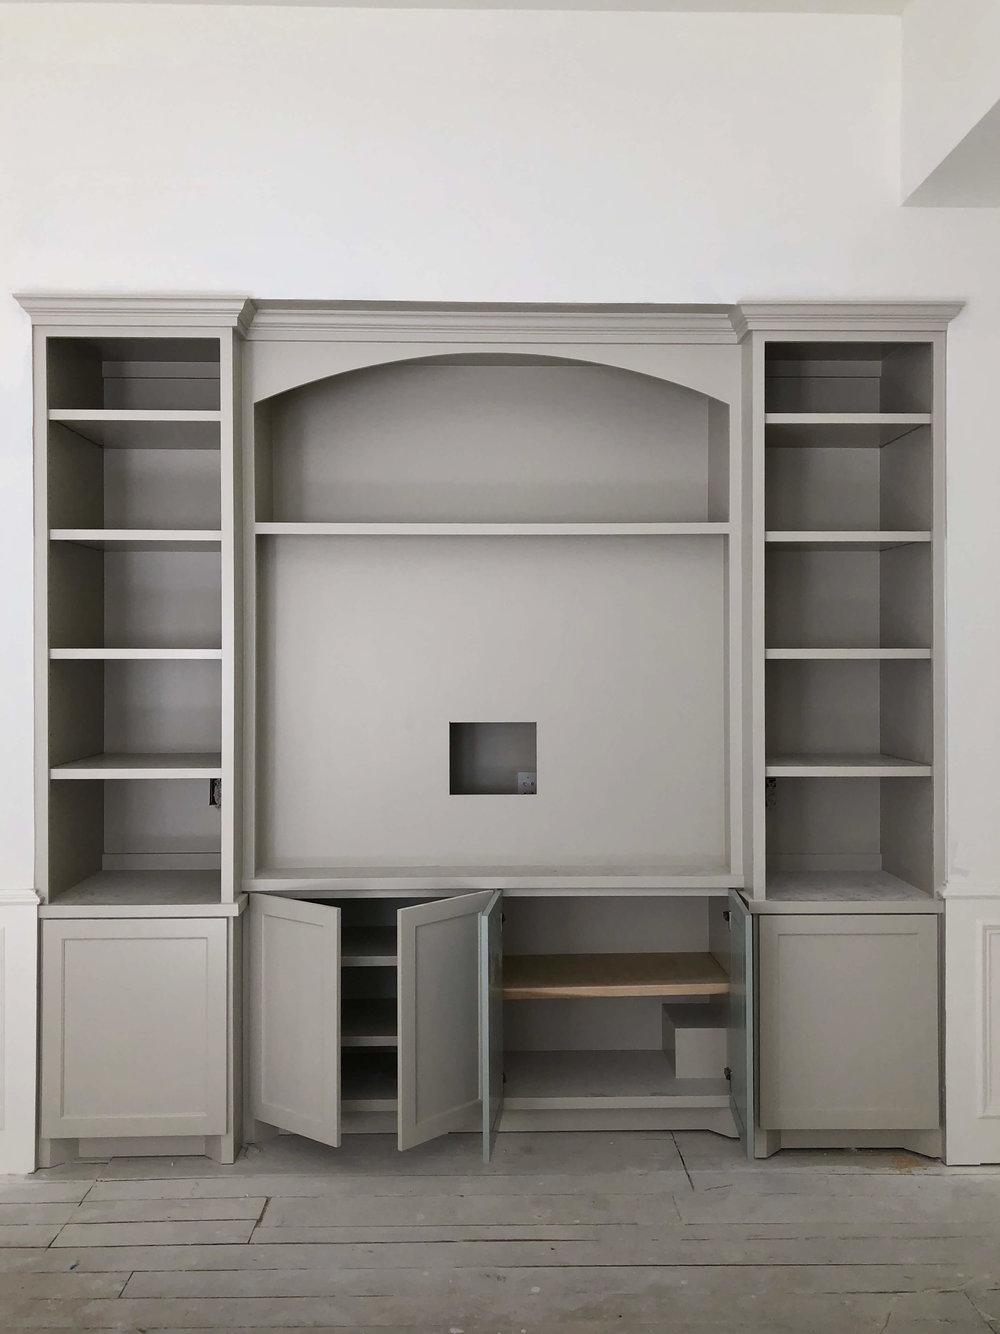 Remodel in progress - Gameroom cabinetry for flat screen tv